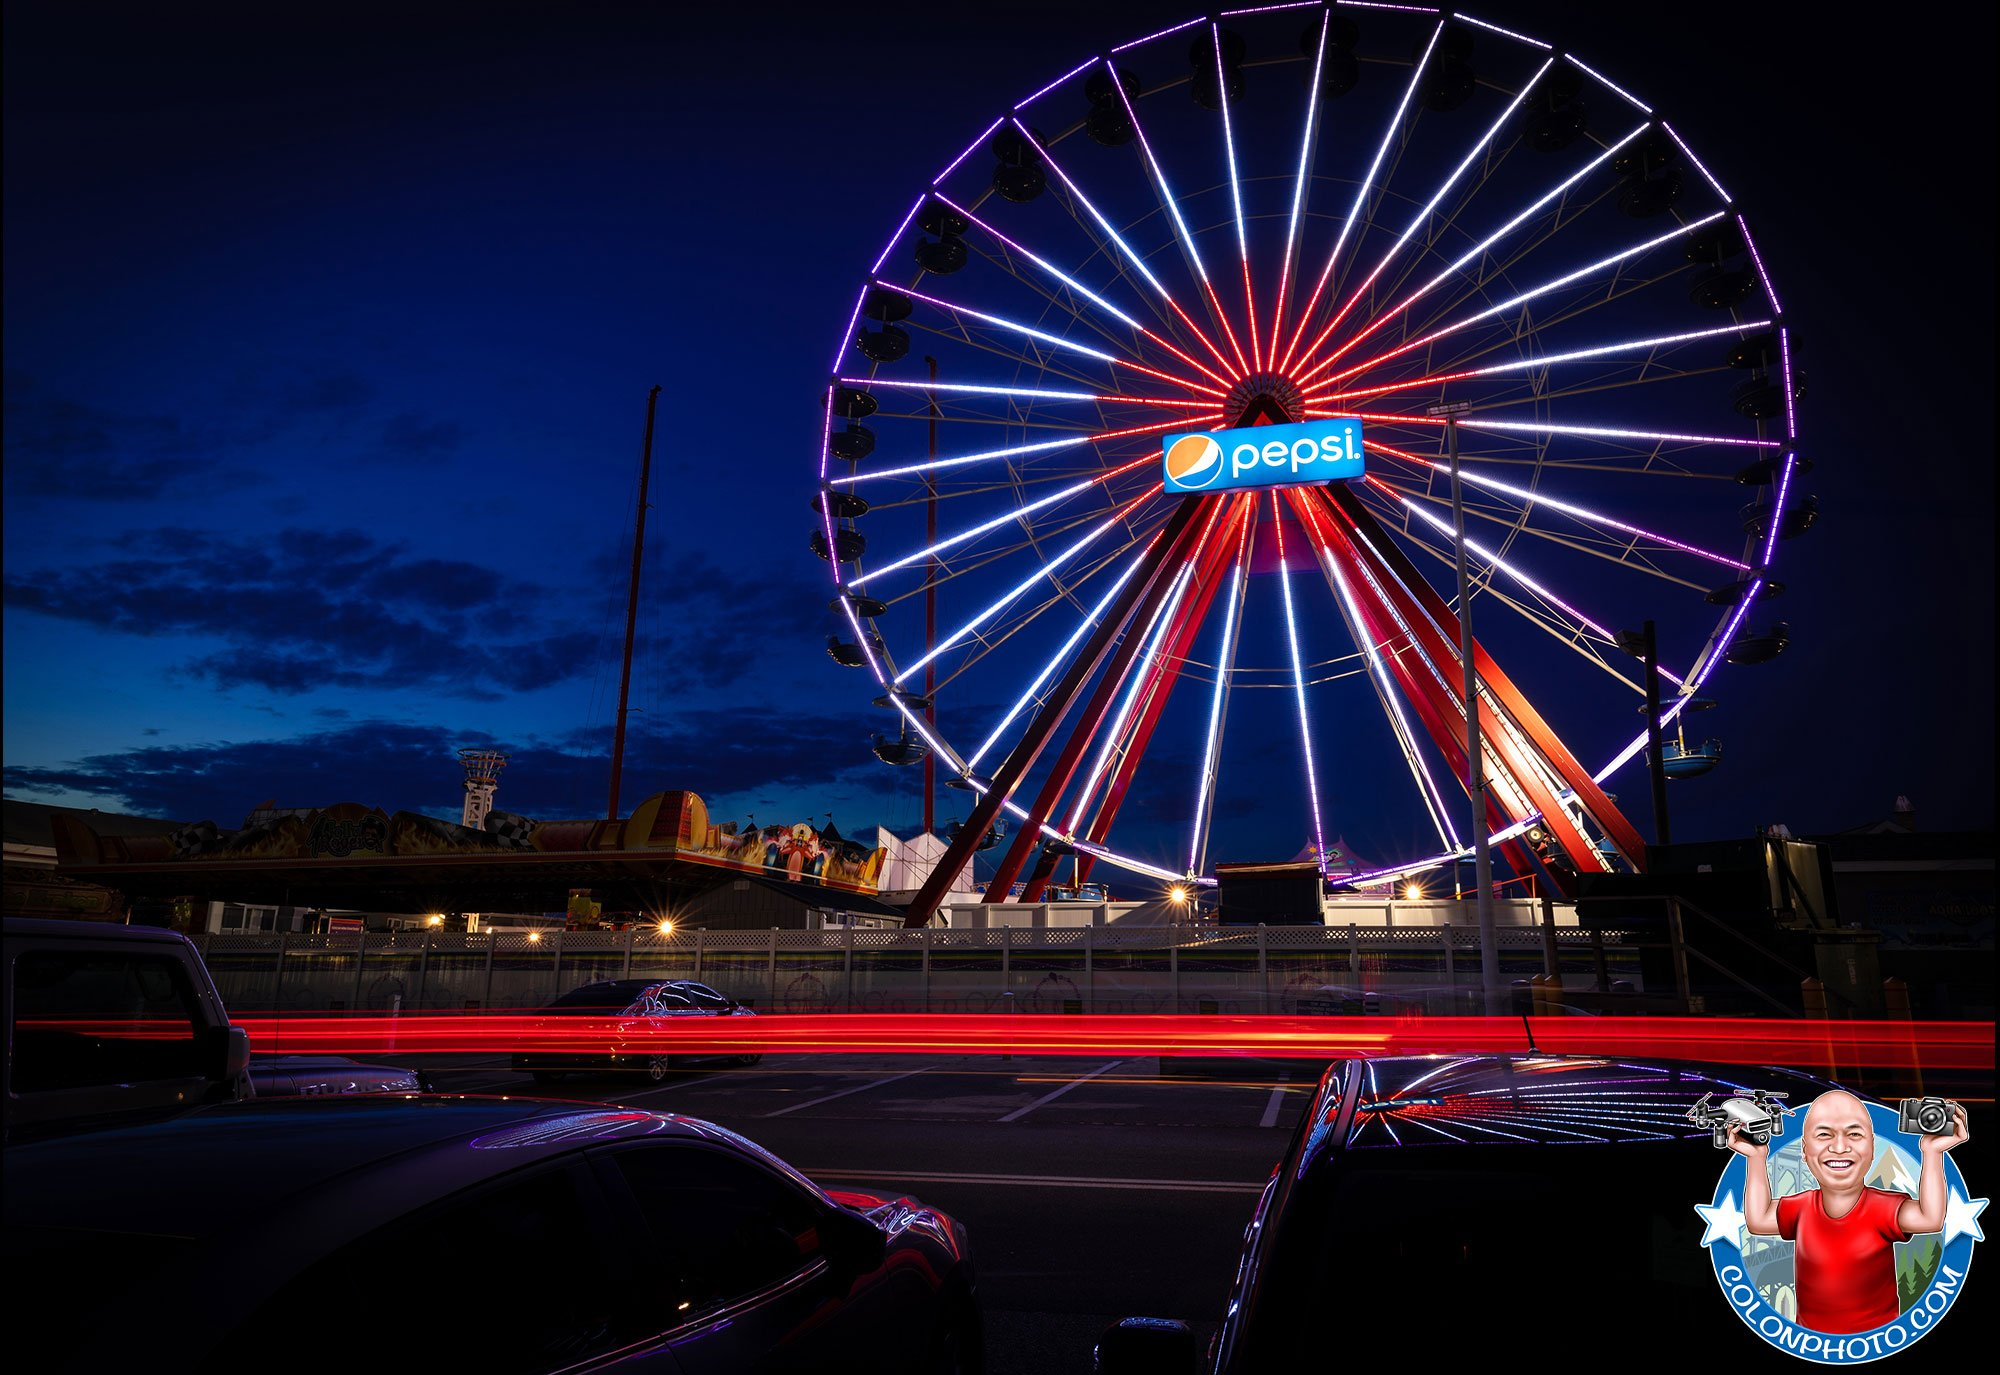 OCEAN-CITY-MARYLAND-BOARDWALK-NIGHT-PHOTO-LONG-EXPOSURE---colonphoto.com